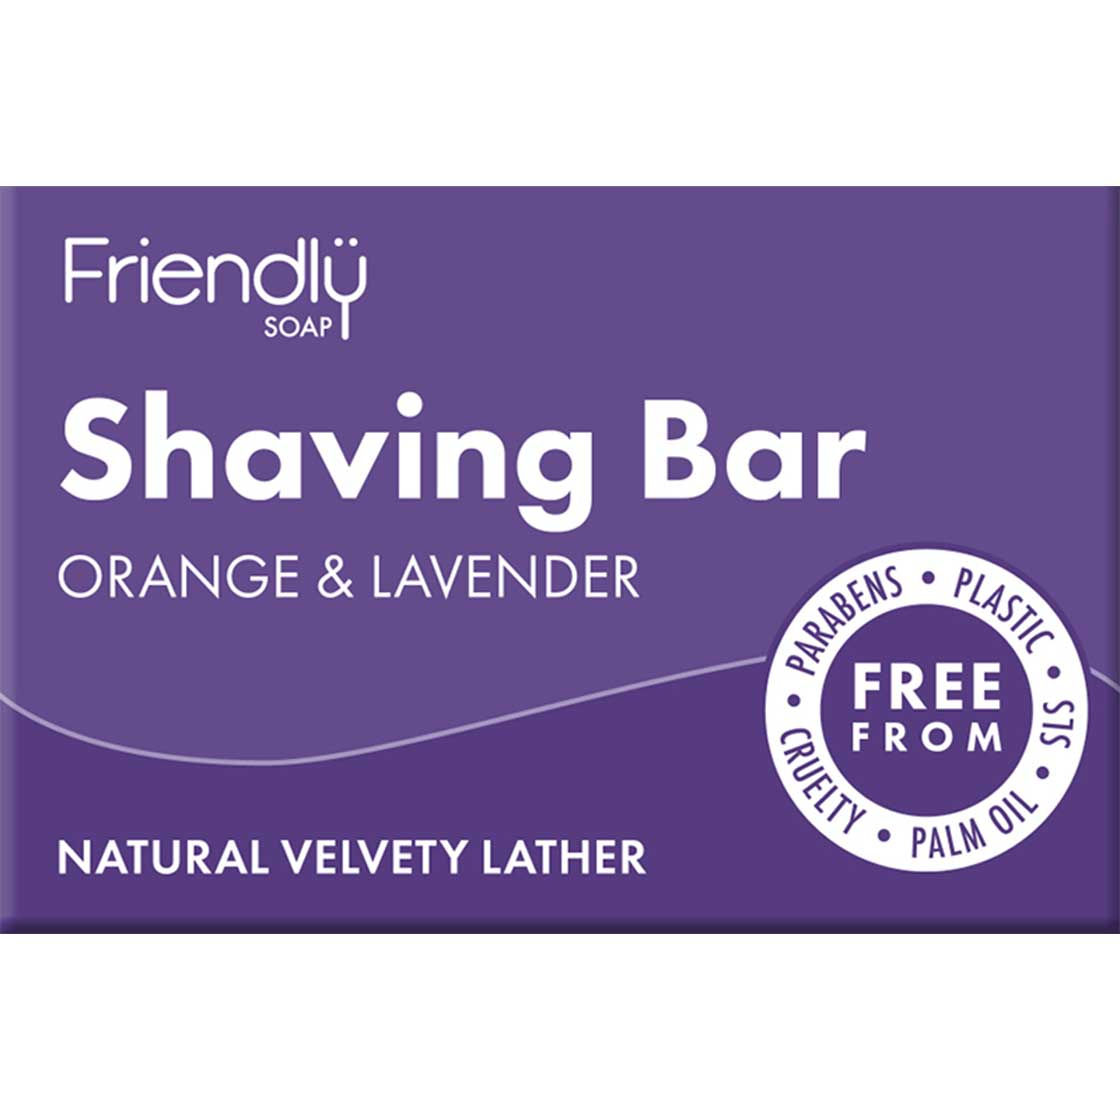 Shaving Bar - Orange & Lavender by Friendly Soap